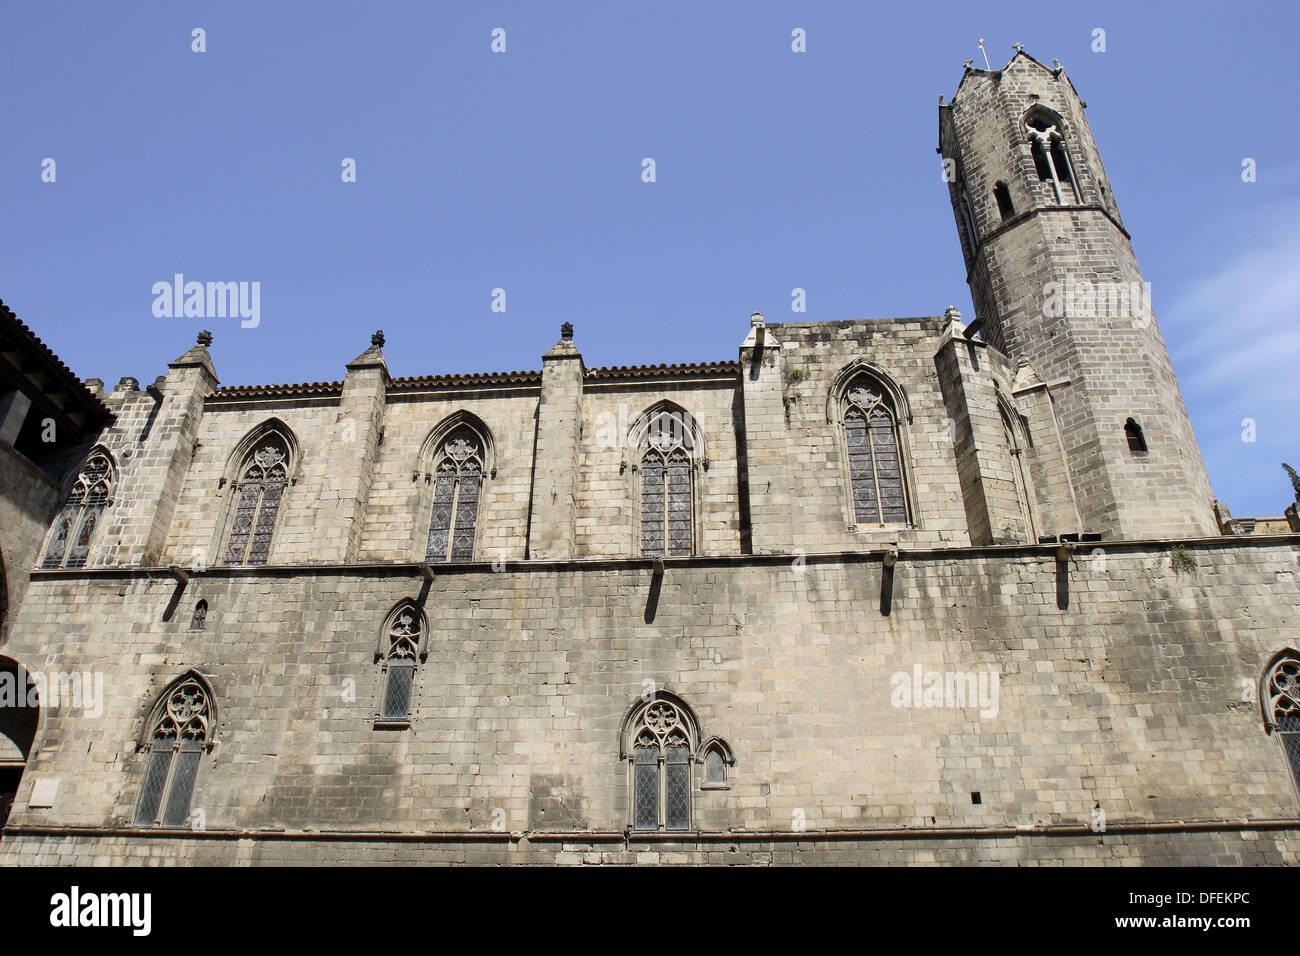 Royal chapel of Santa Àgata, Plaça del Rei, Gothic quarter, Barcelona. Catalonia, Spain - Stock Image